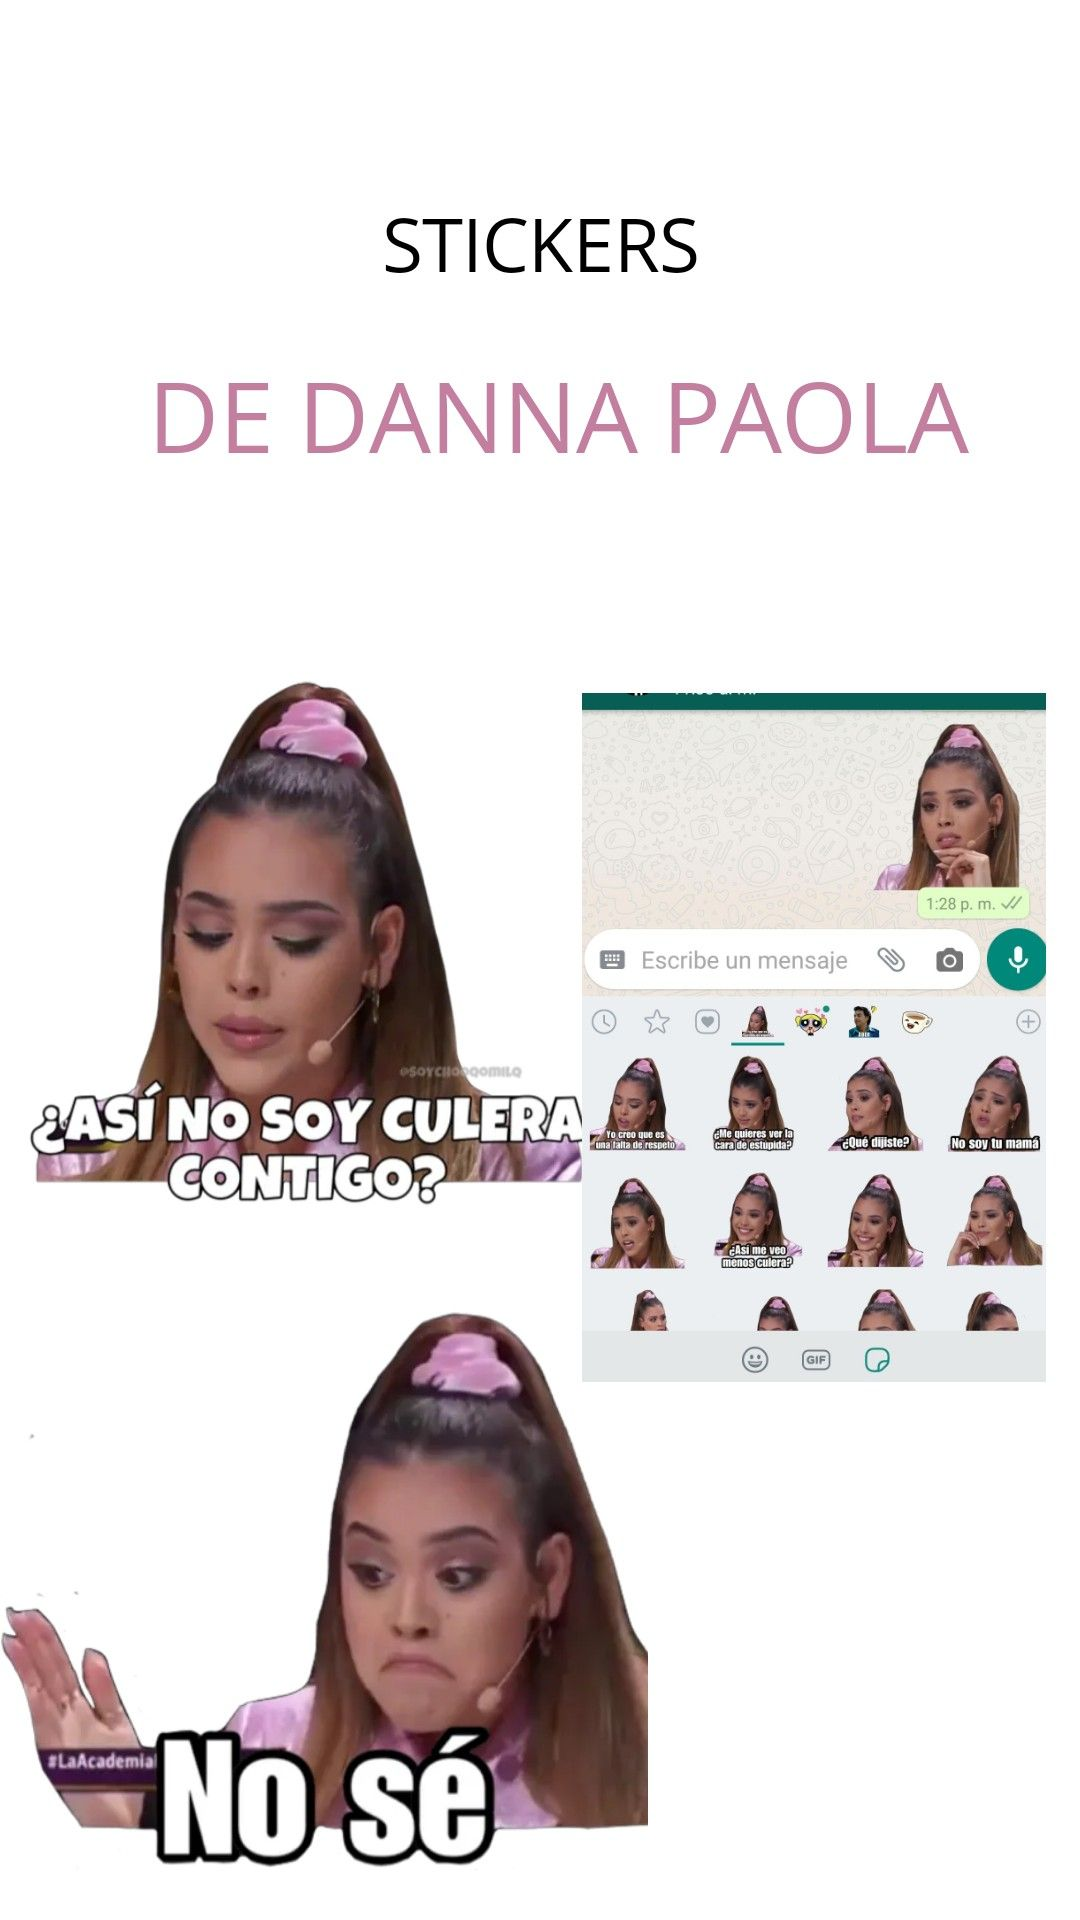 Stickers De Danna Paola Imagenes Divertidas Para Whatsapp Fotos Chistosas Para Whatsapp Caras Para Stickers